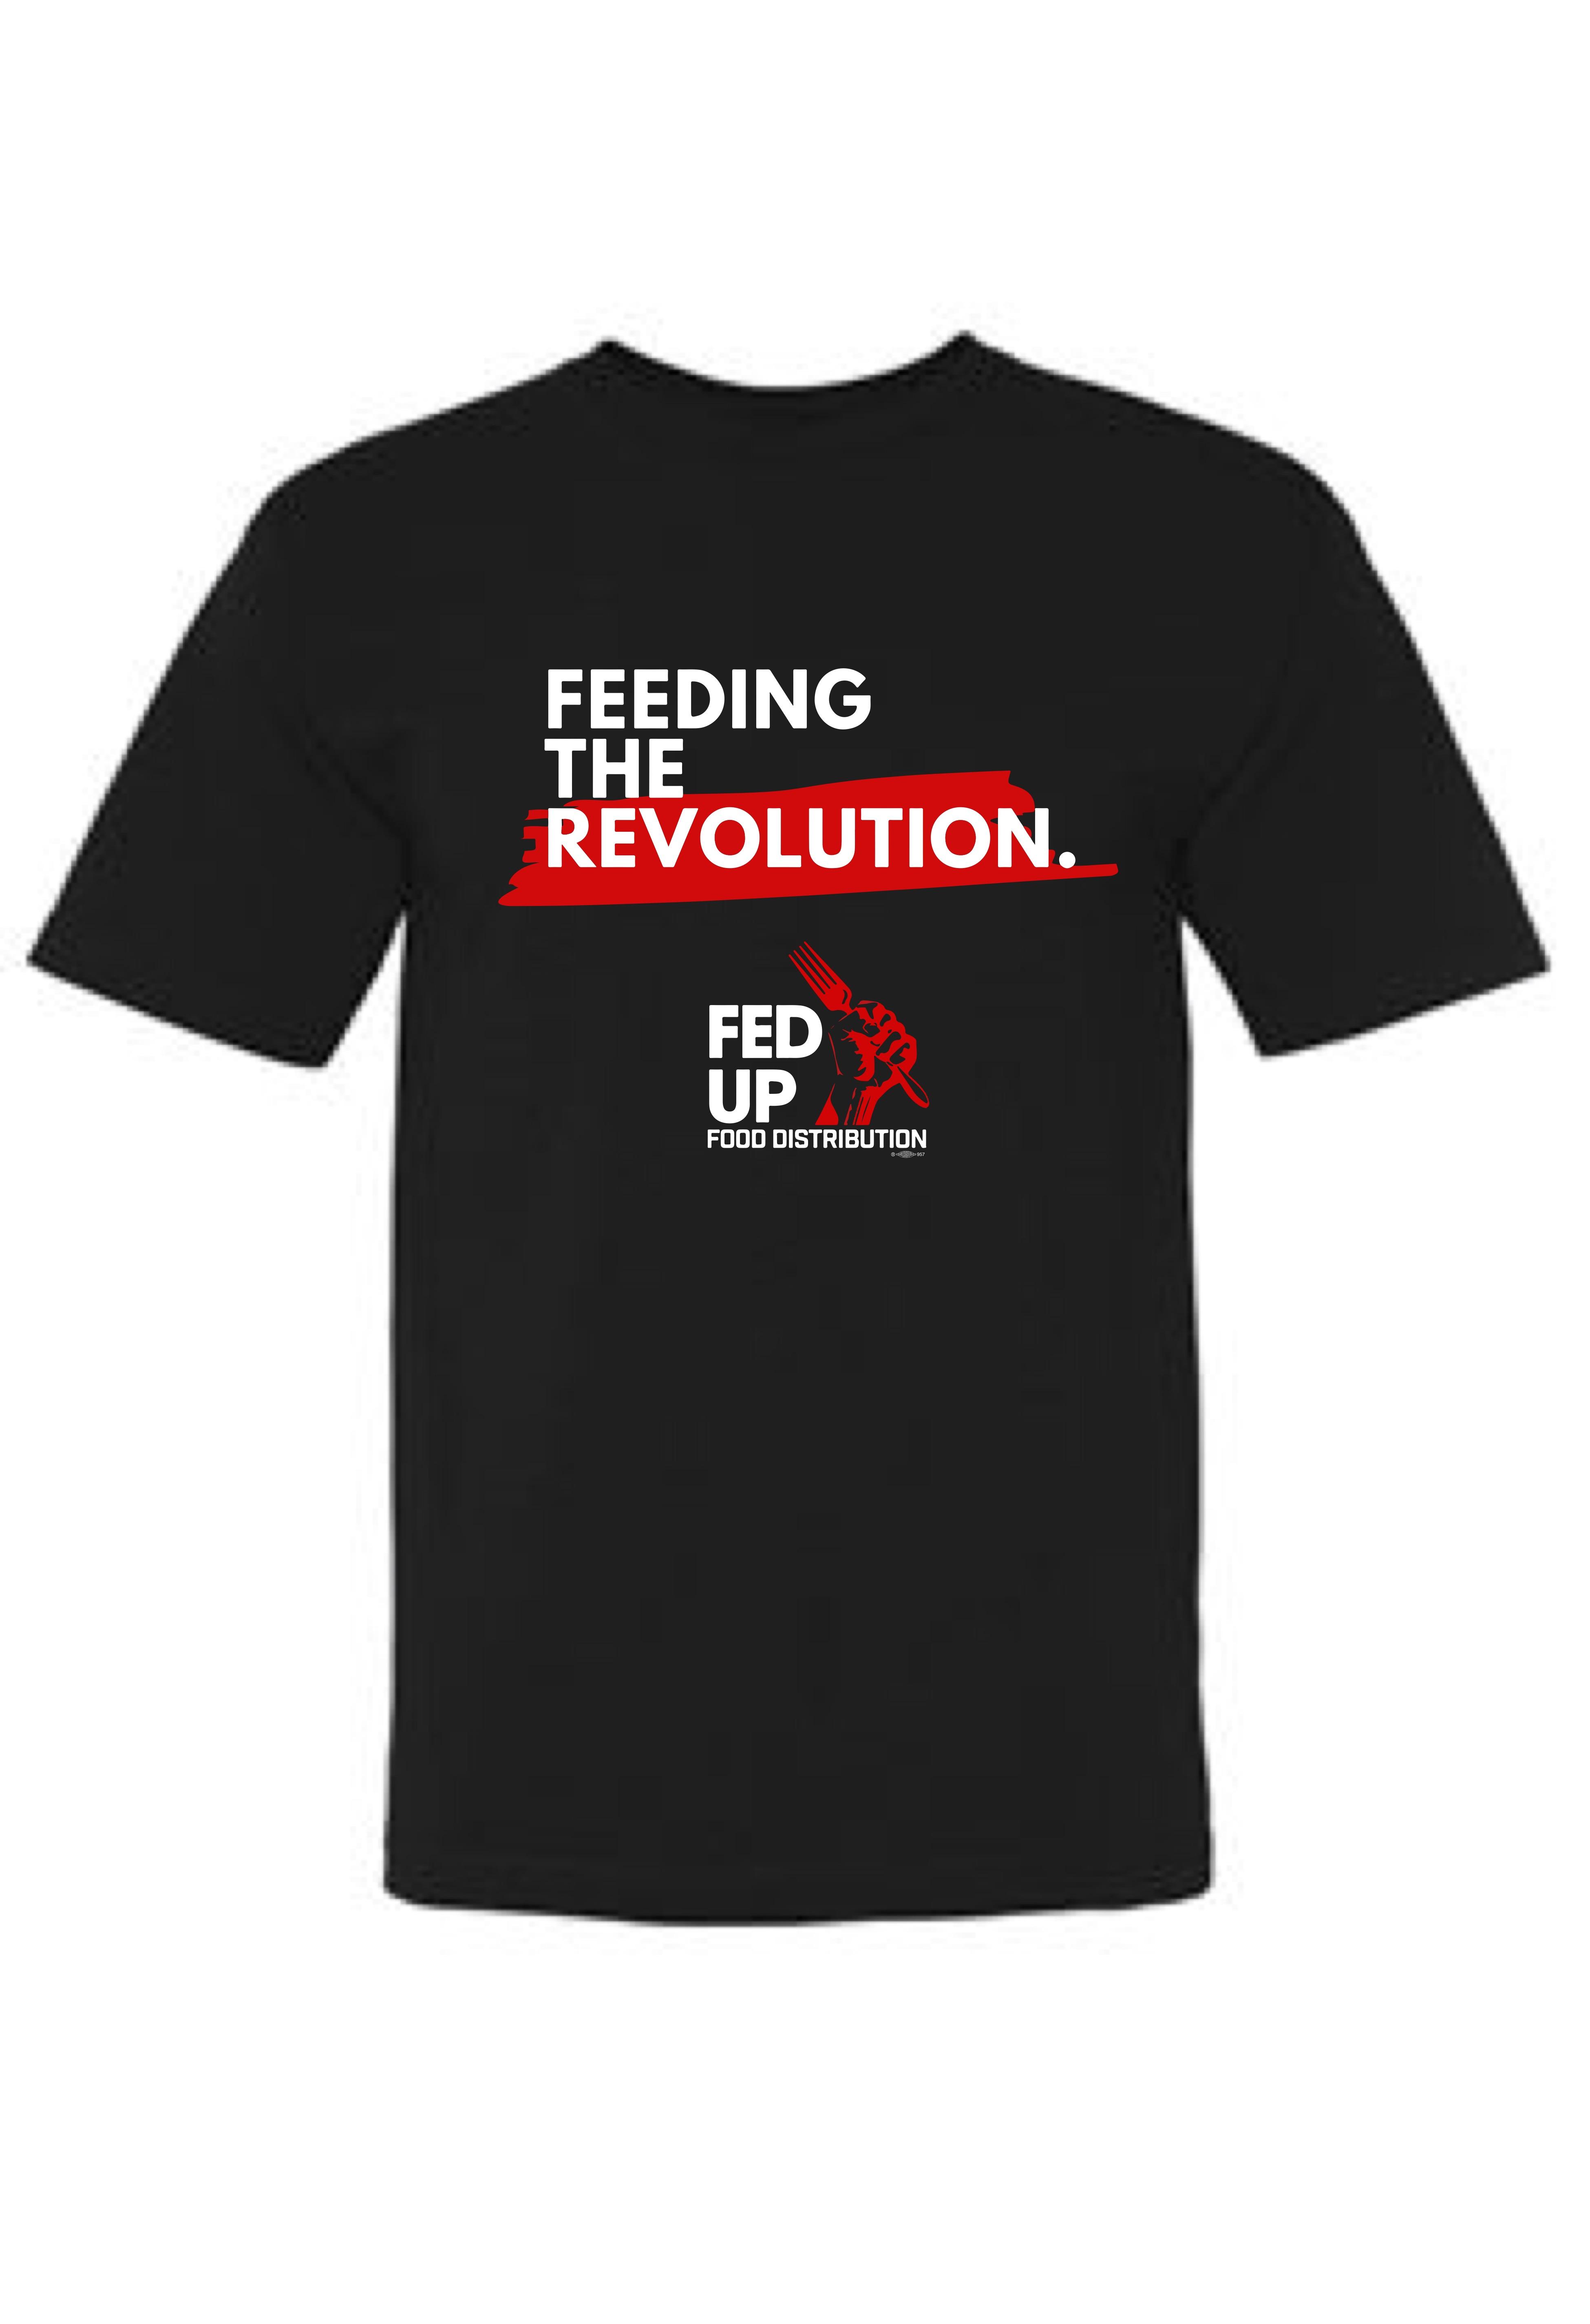 Fed_up_t-shirt_designs_feeding_the_revolution